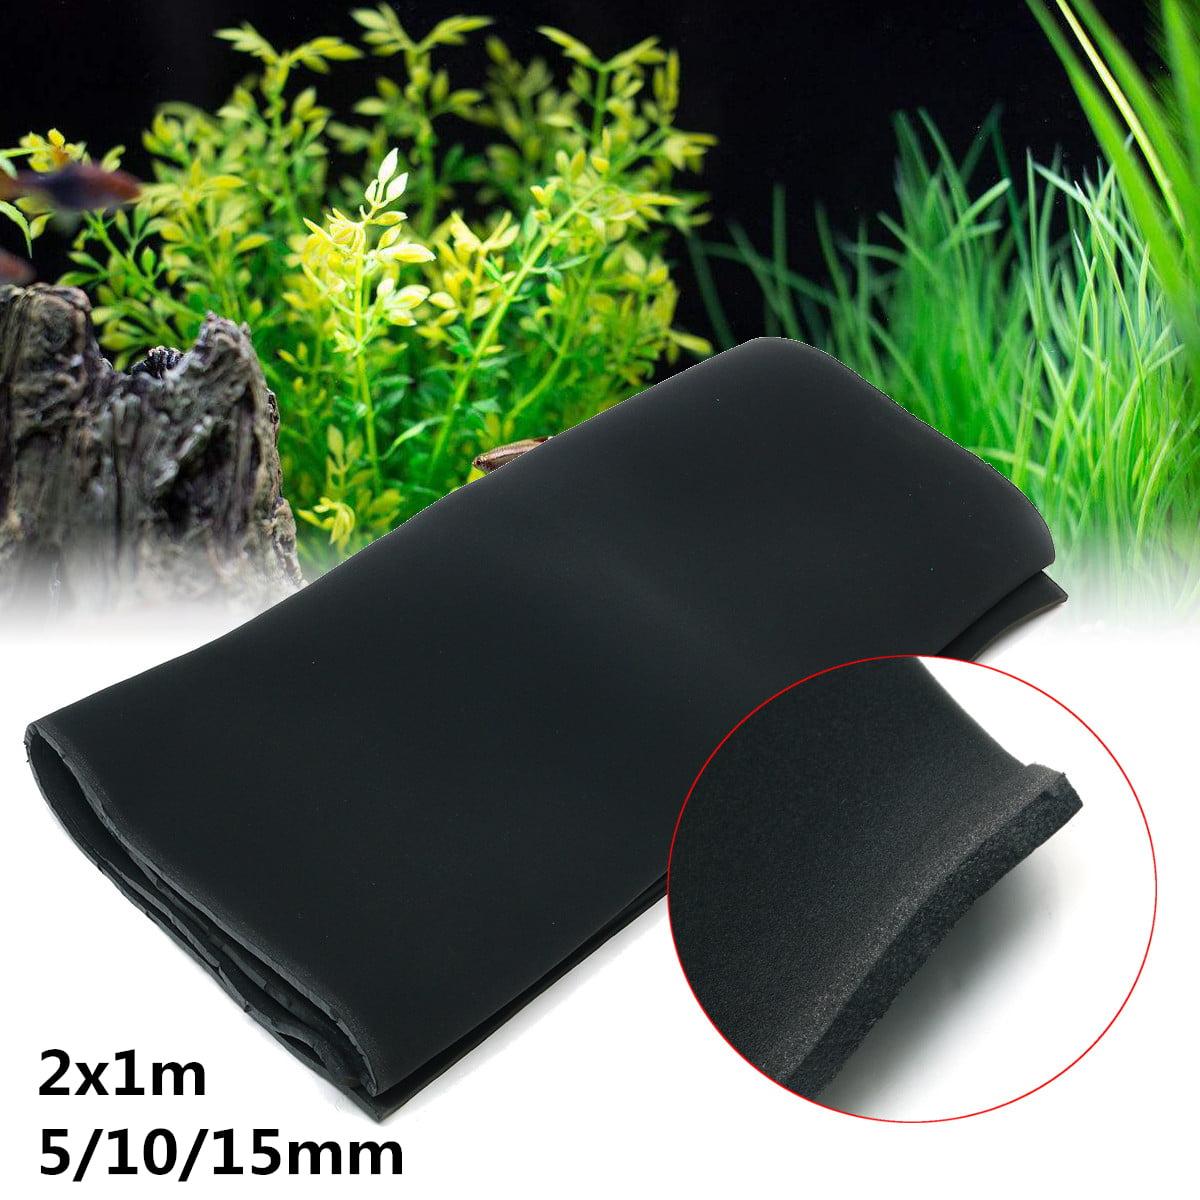 Black Aquarium Biochemical Filter Foam Cotton Sponge Fish Tank Pond